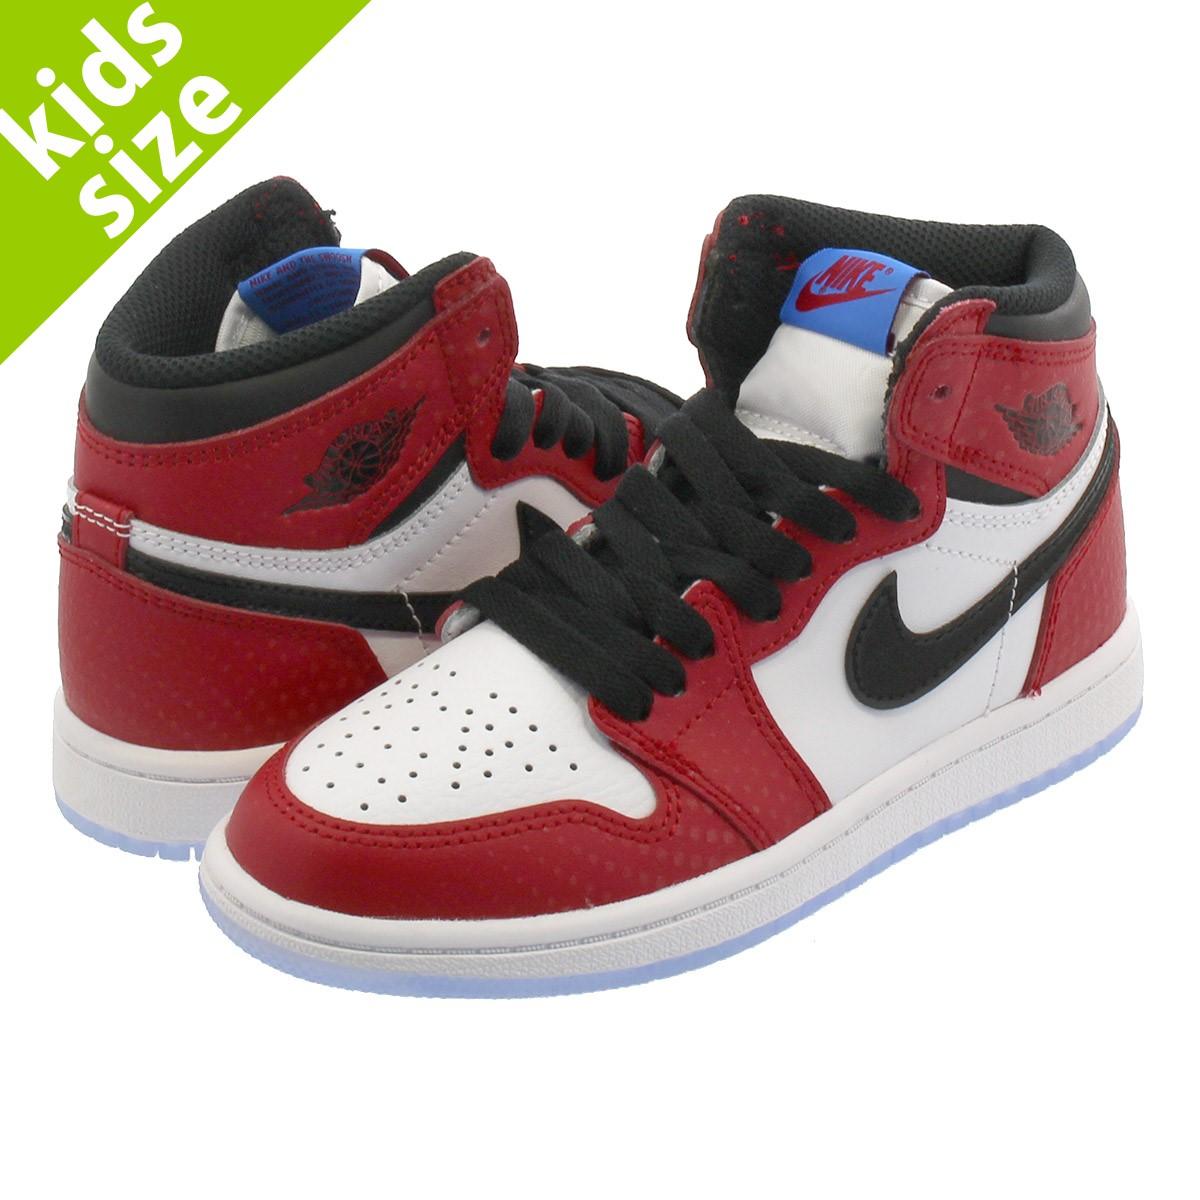 11739b3c117549 NIKE AIR JORDAN 1 RETRO HIGH OG BP Nike Air Jordan 1 nostalgic high OG BP  GYM RED WHITE PHOTO BLUE BLACK